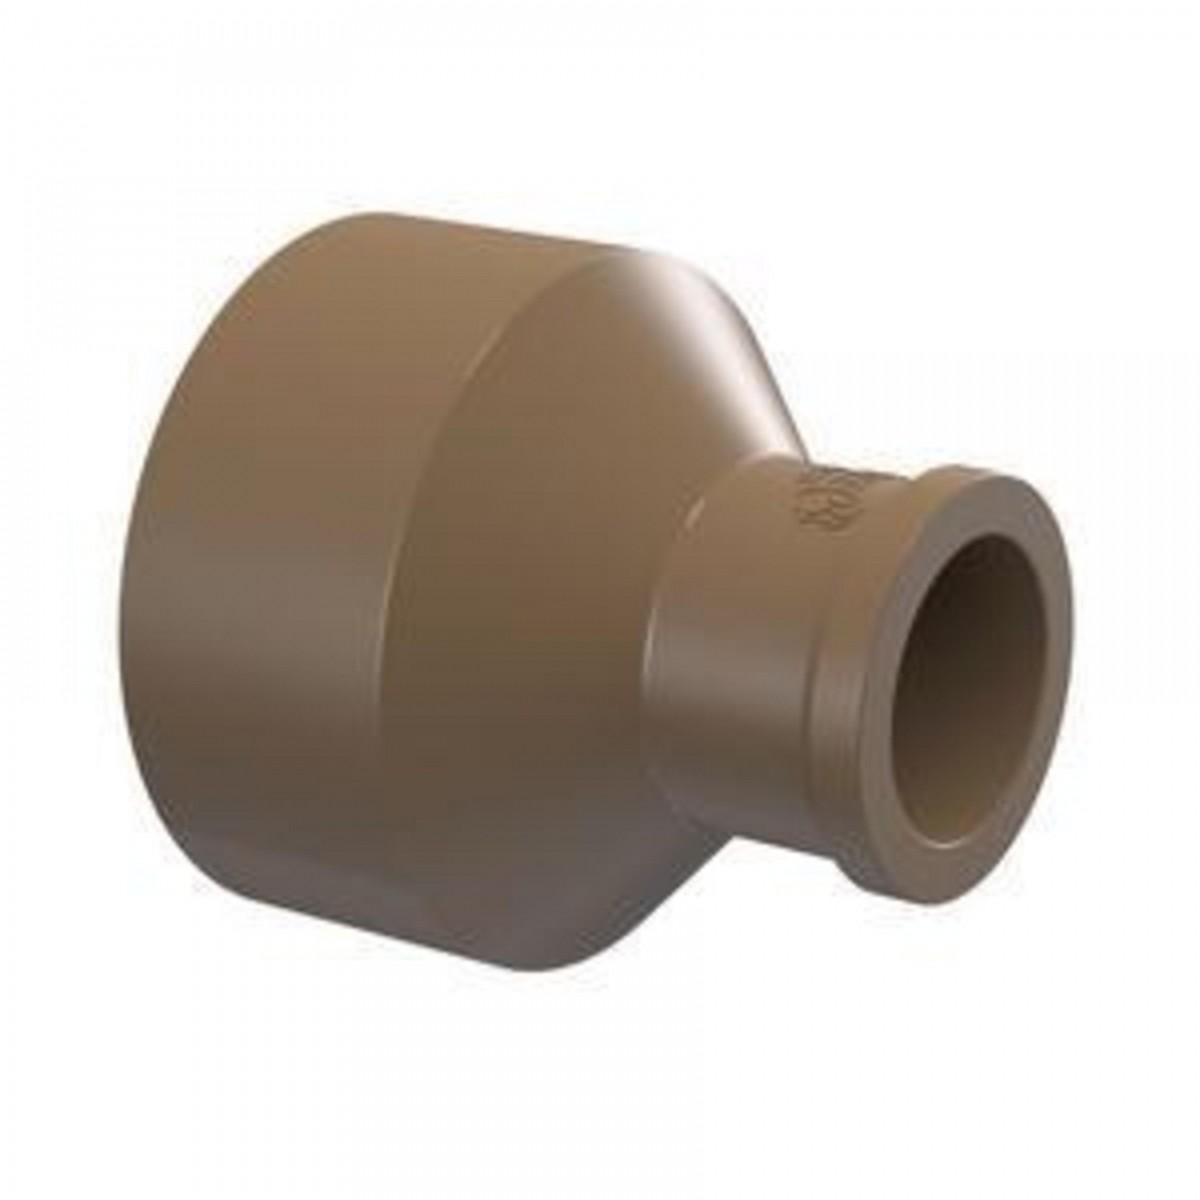 Solda Bucha de Redução Longa 60x32mm (2x1